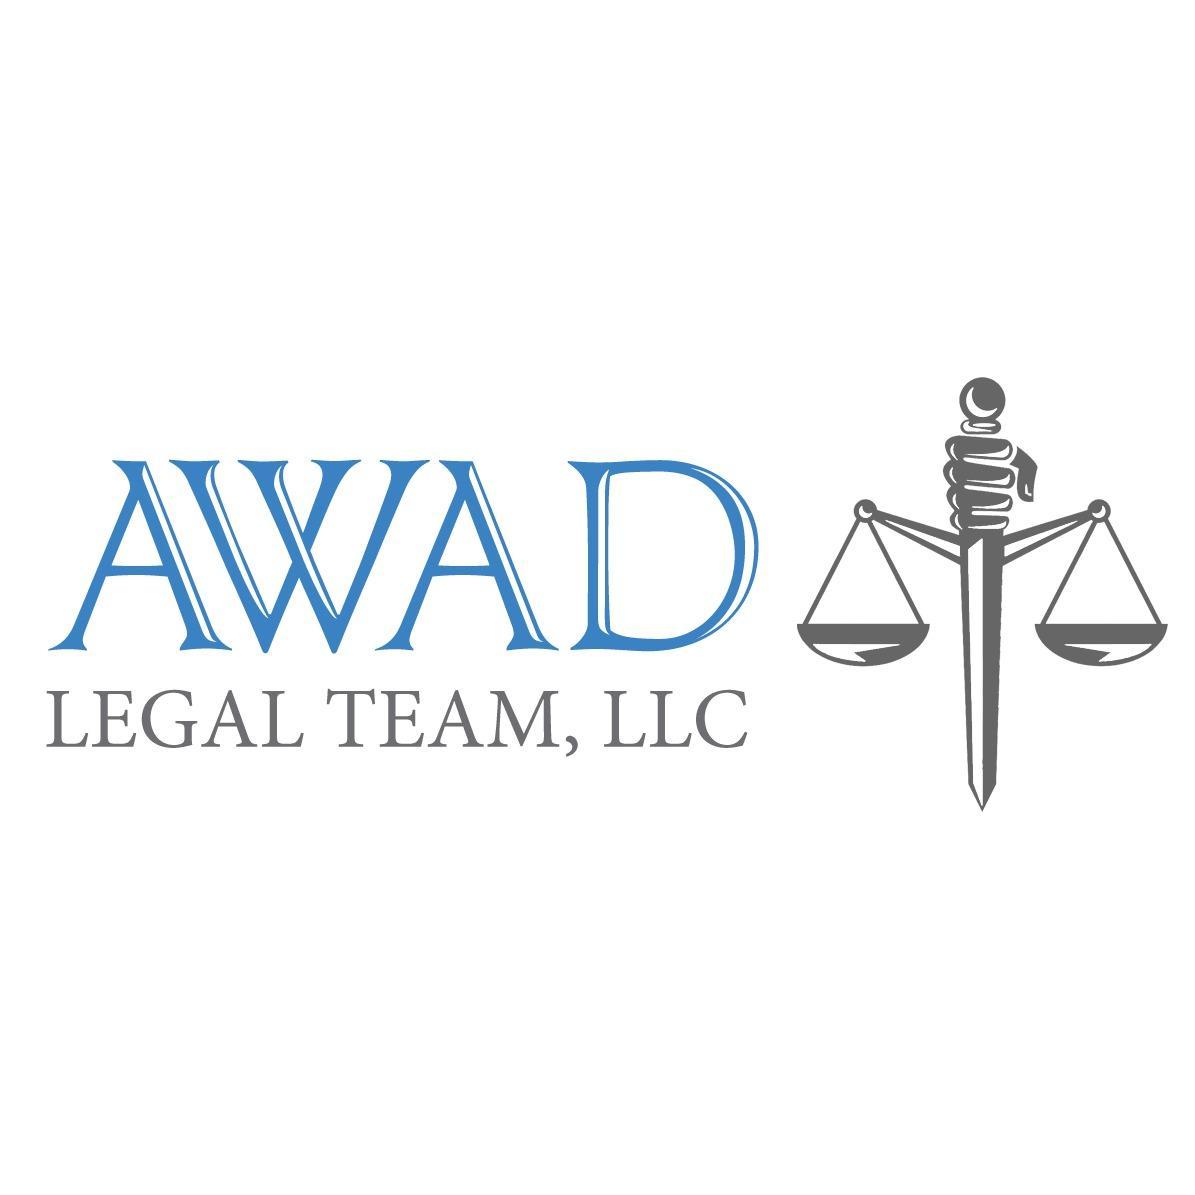 photo of Awad Legal Team, LLC